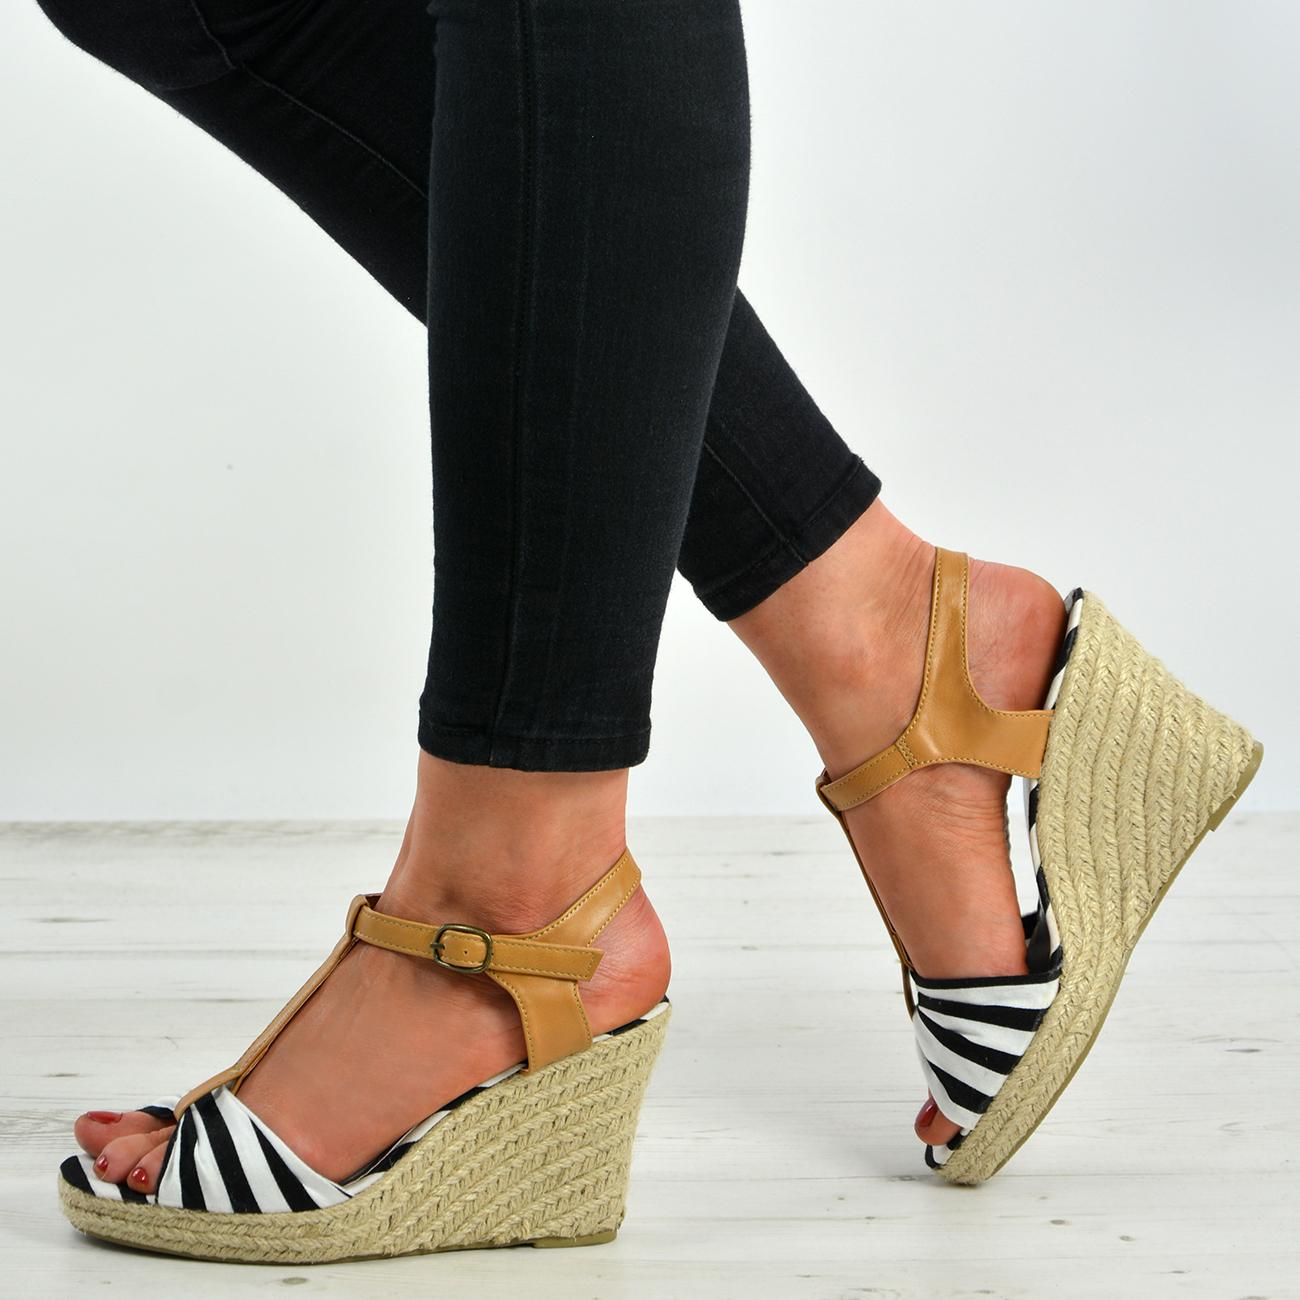 2ae9883ed18 Womens Ladies Ankle Strap Espadrille Wedge Heel Platform Sandals ...